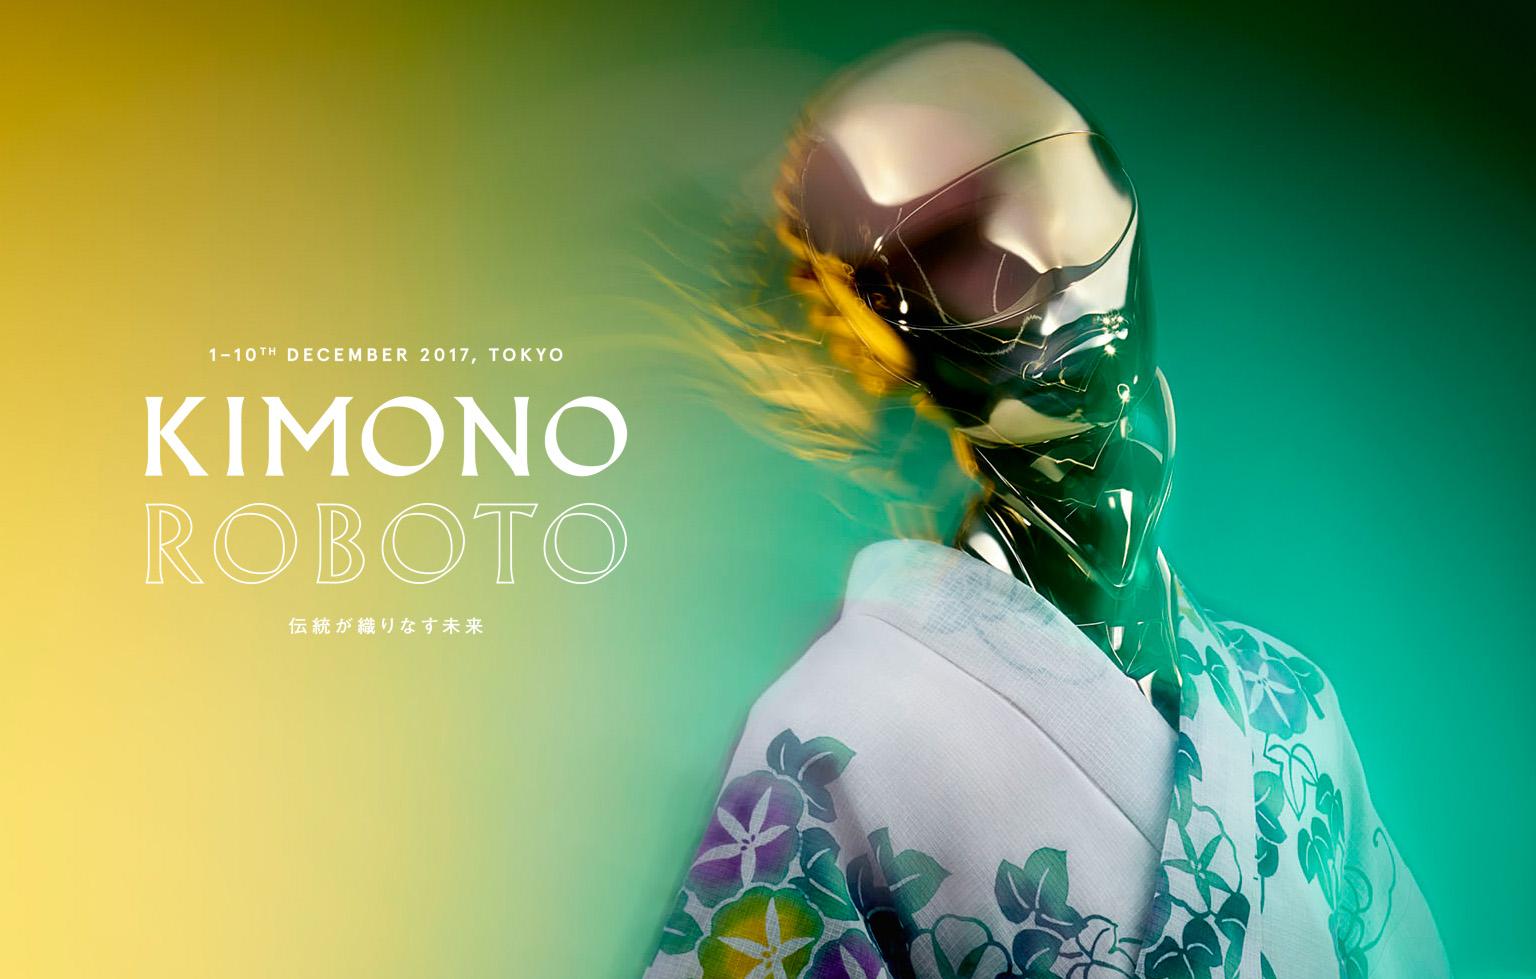 KimonoRoboto_posters 5